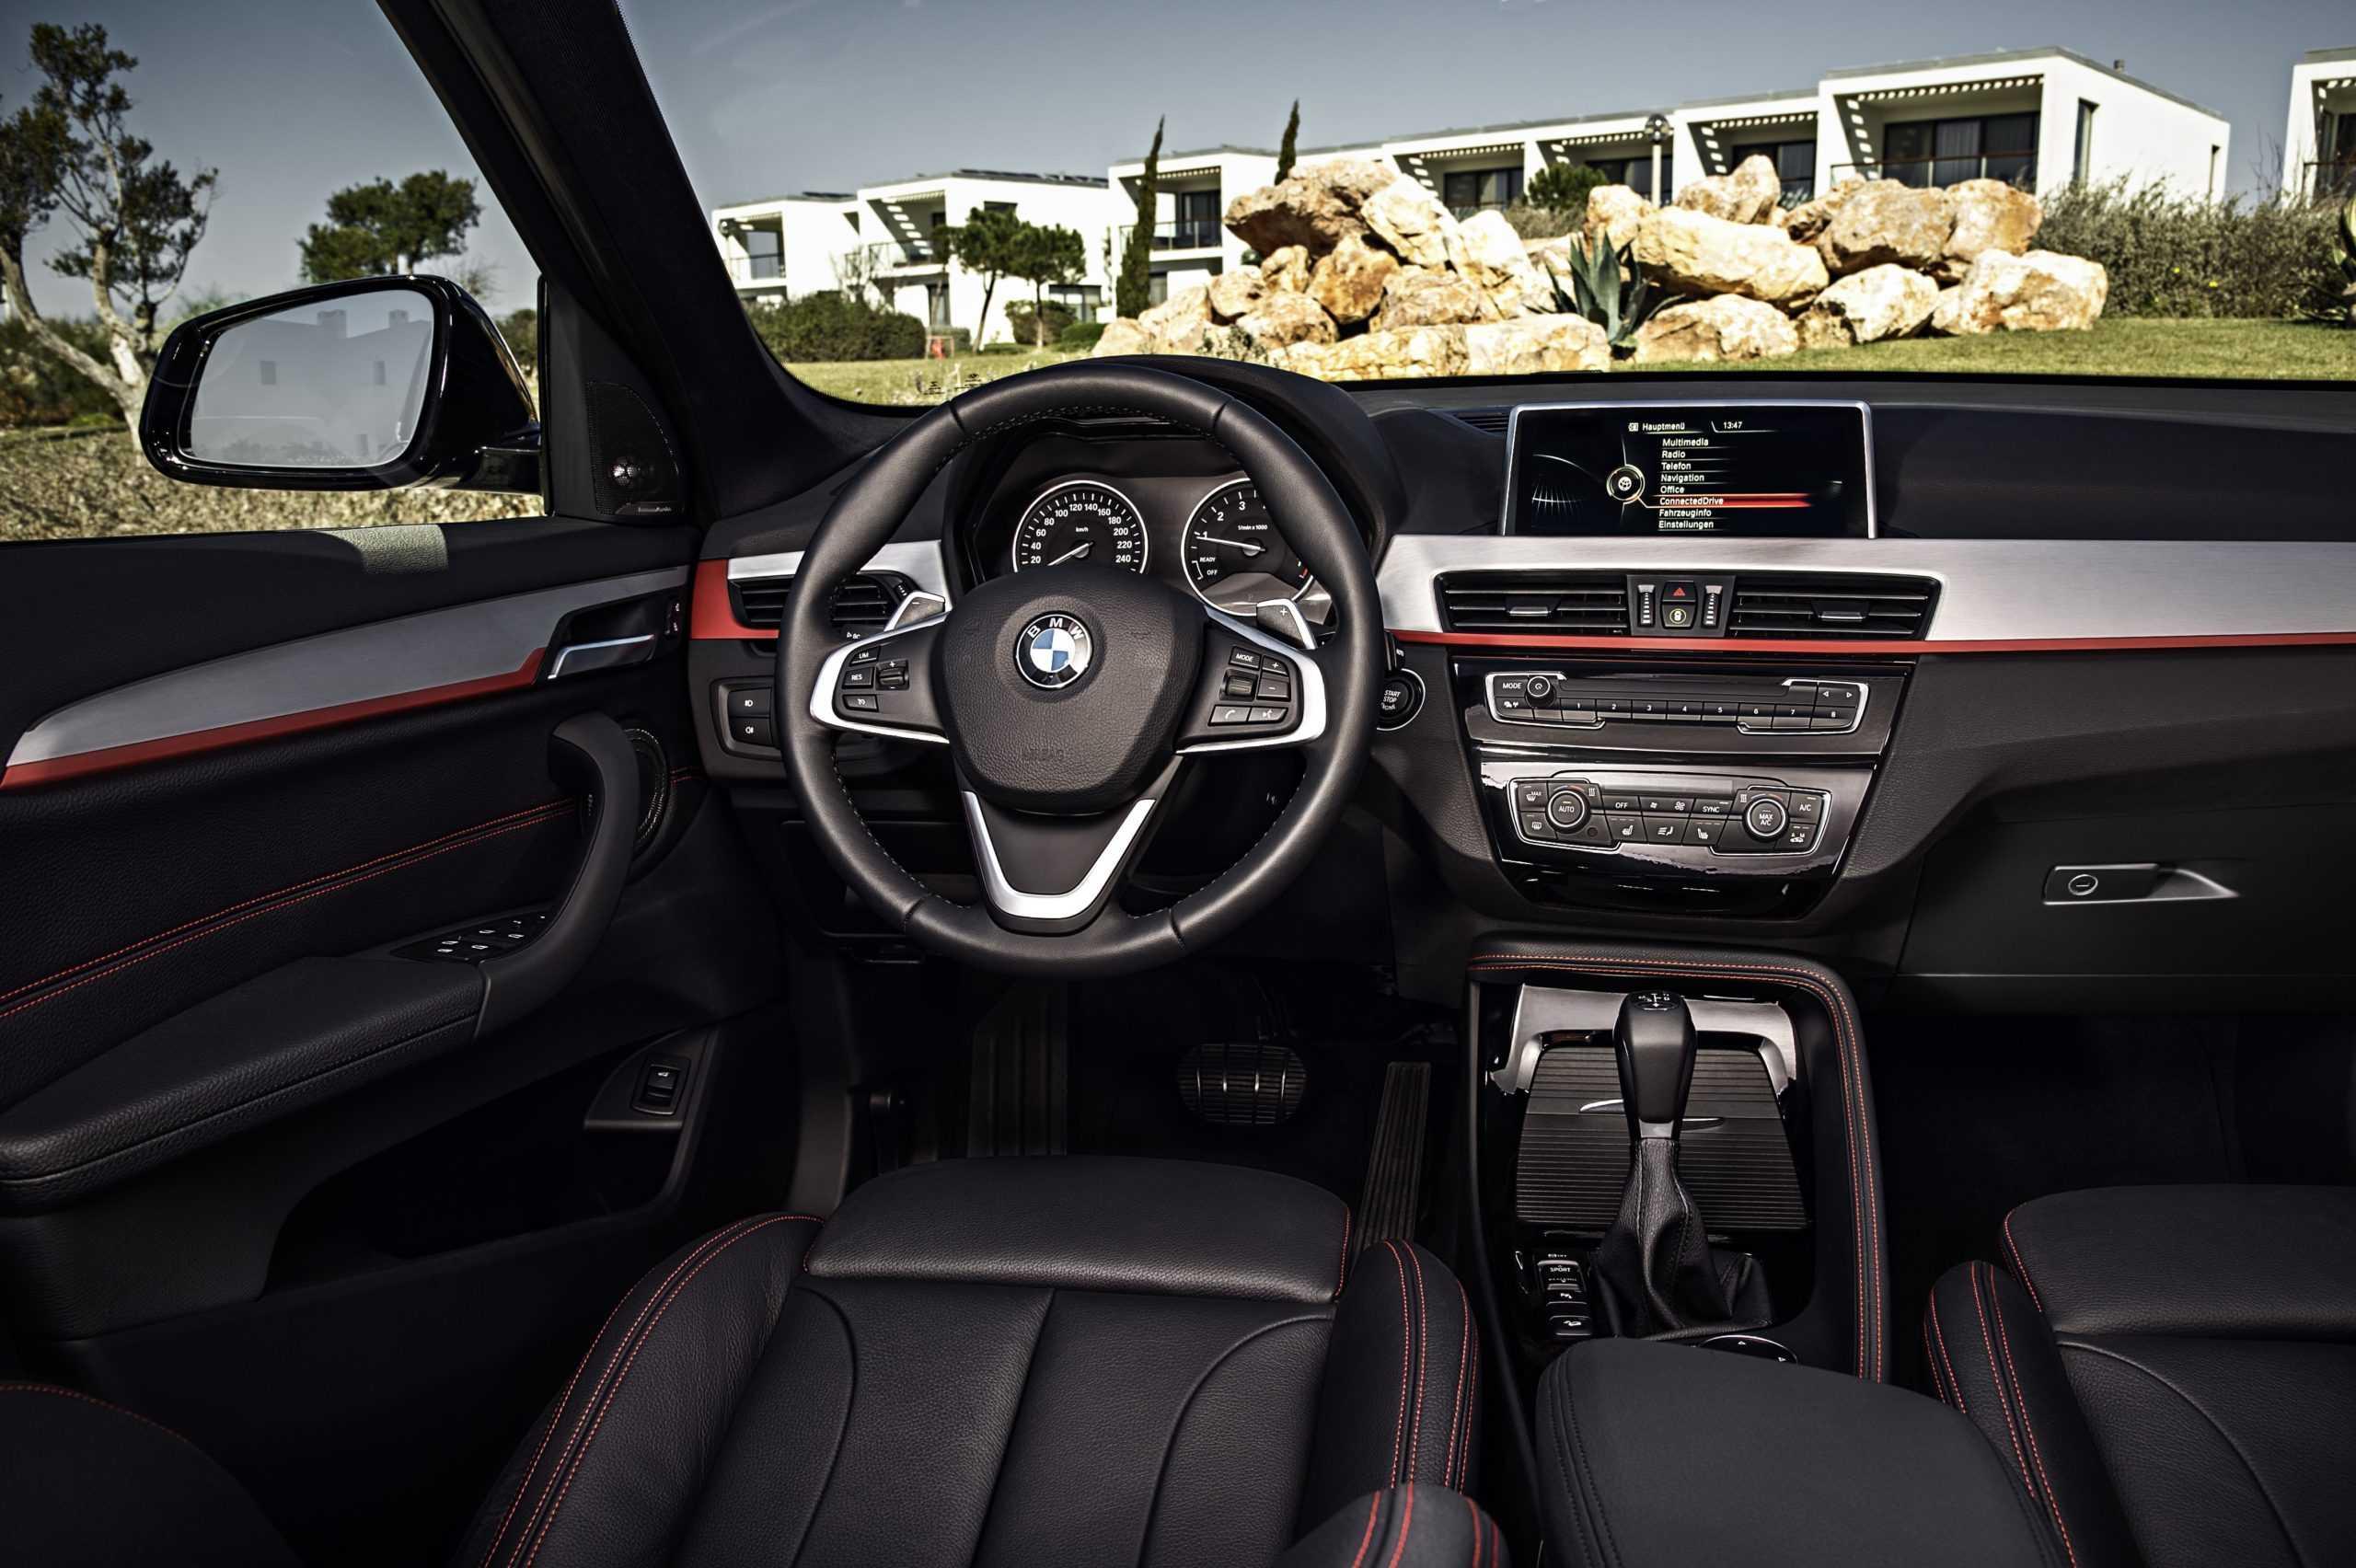 Замена топливного фильтра BMW X1 (E84), цена на замену топливного фильтра БМВ Х1 (Е84)